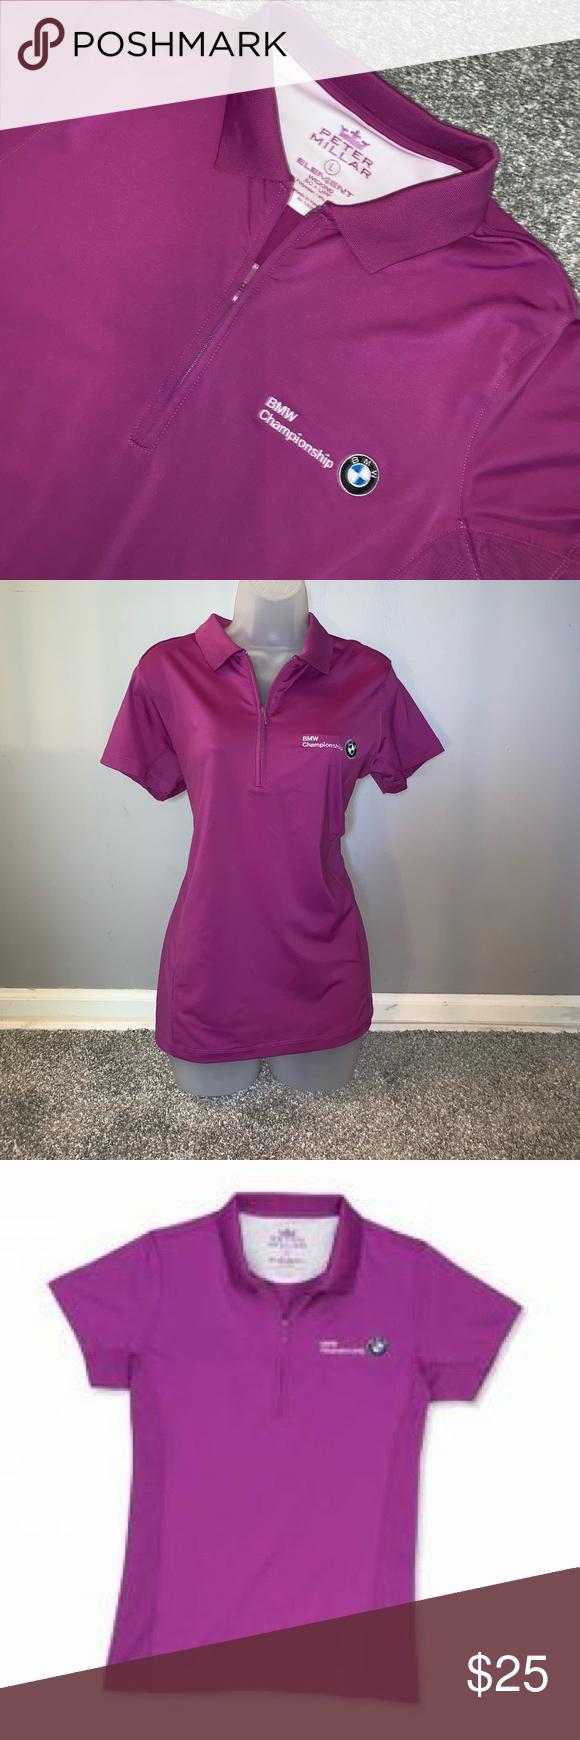 27++ Bmw championship golf shirts ideas